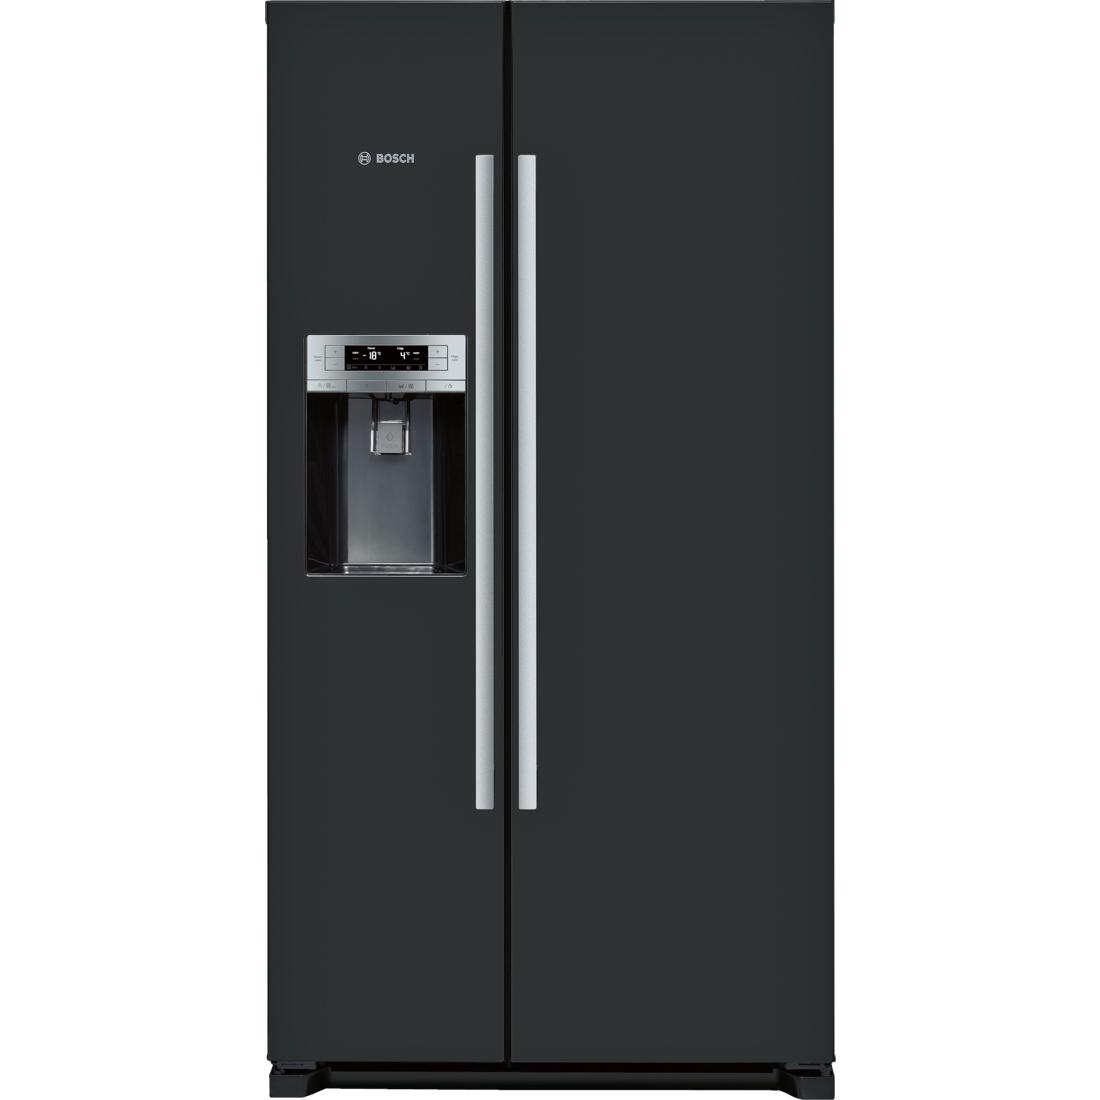 Bosch kad90vb20 major household appliances appliances for Bosch online shop